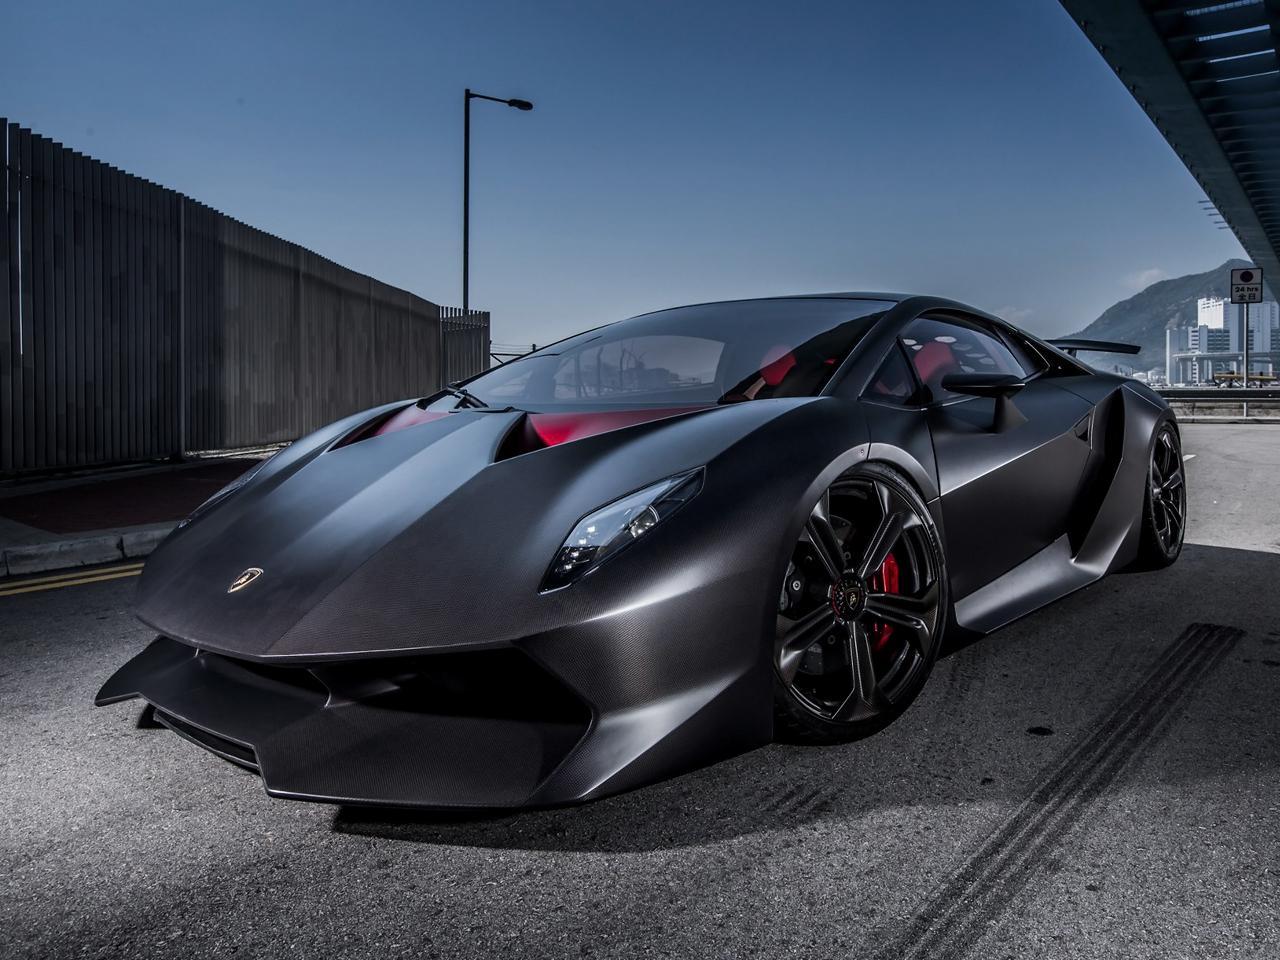 Das sechste Element: Lamborghini Sesto Elemento als Kleinserie fix